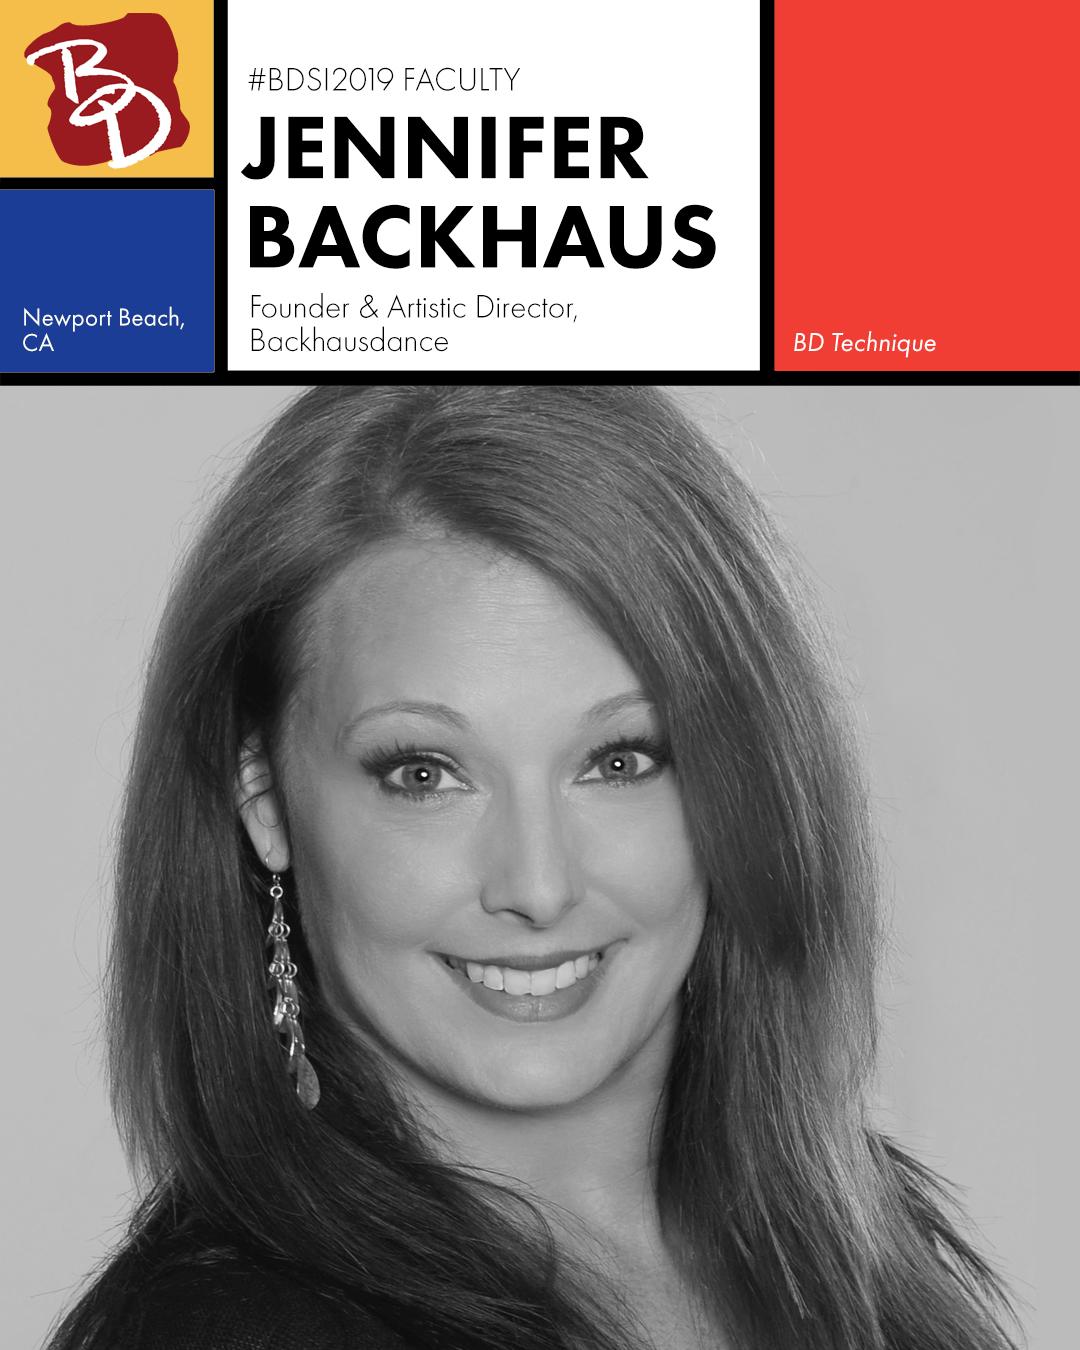 JENNIFER BACKHAUS Backhausdance Artistic Director, Chapman University Professor BD Technique